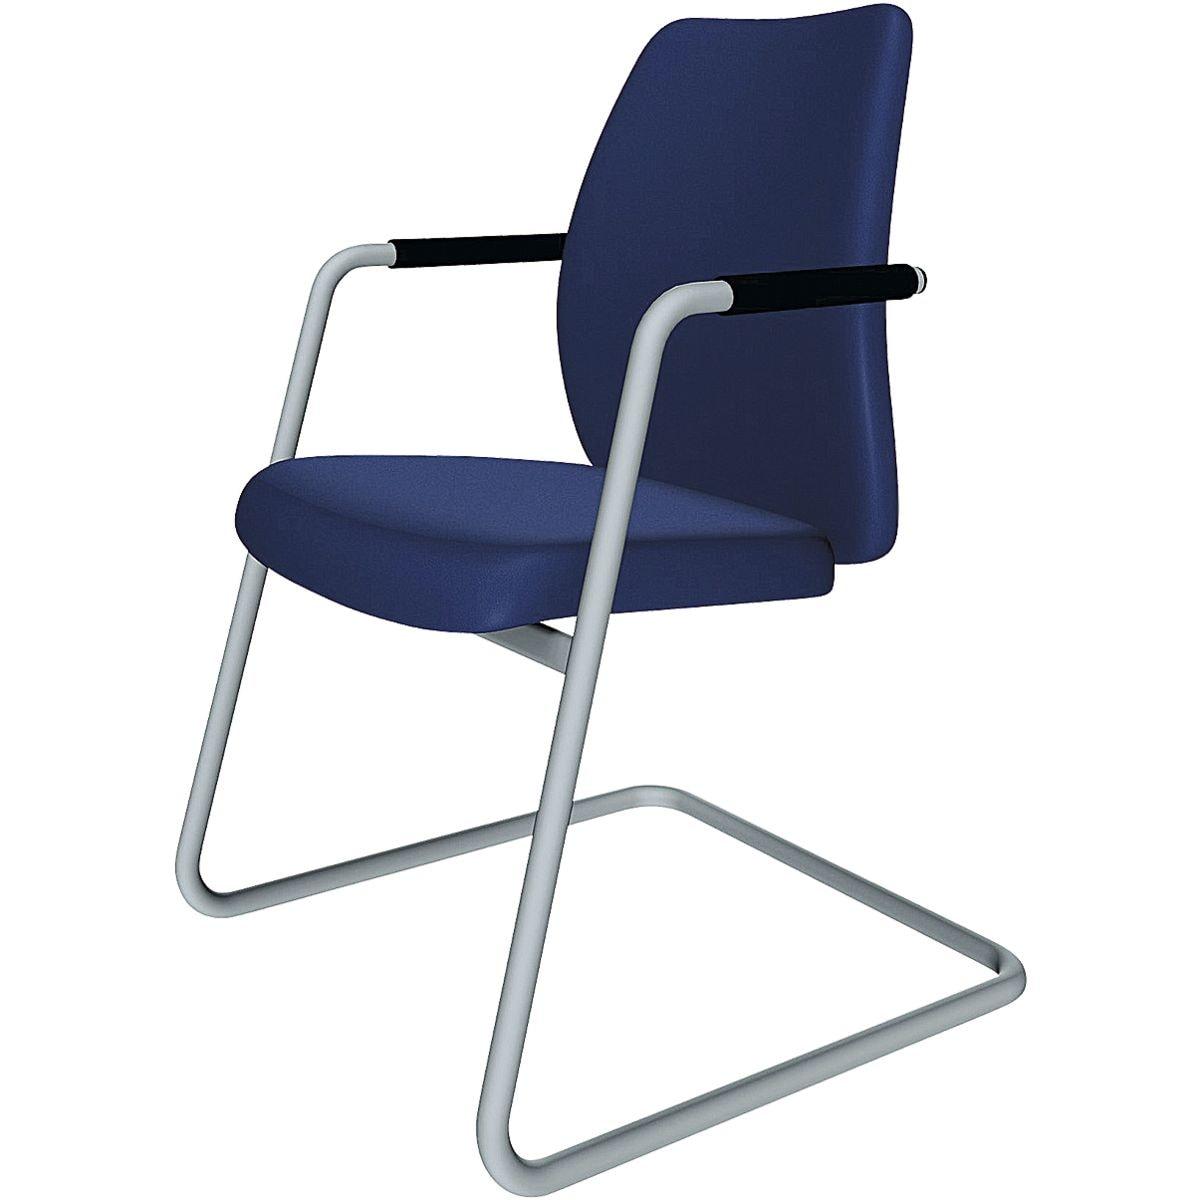 Gemütlich Büromöbel Schneider Galerie - Heimat Ideen ...